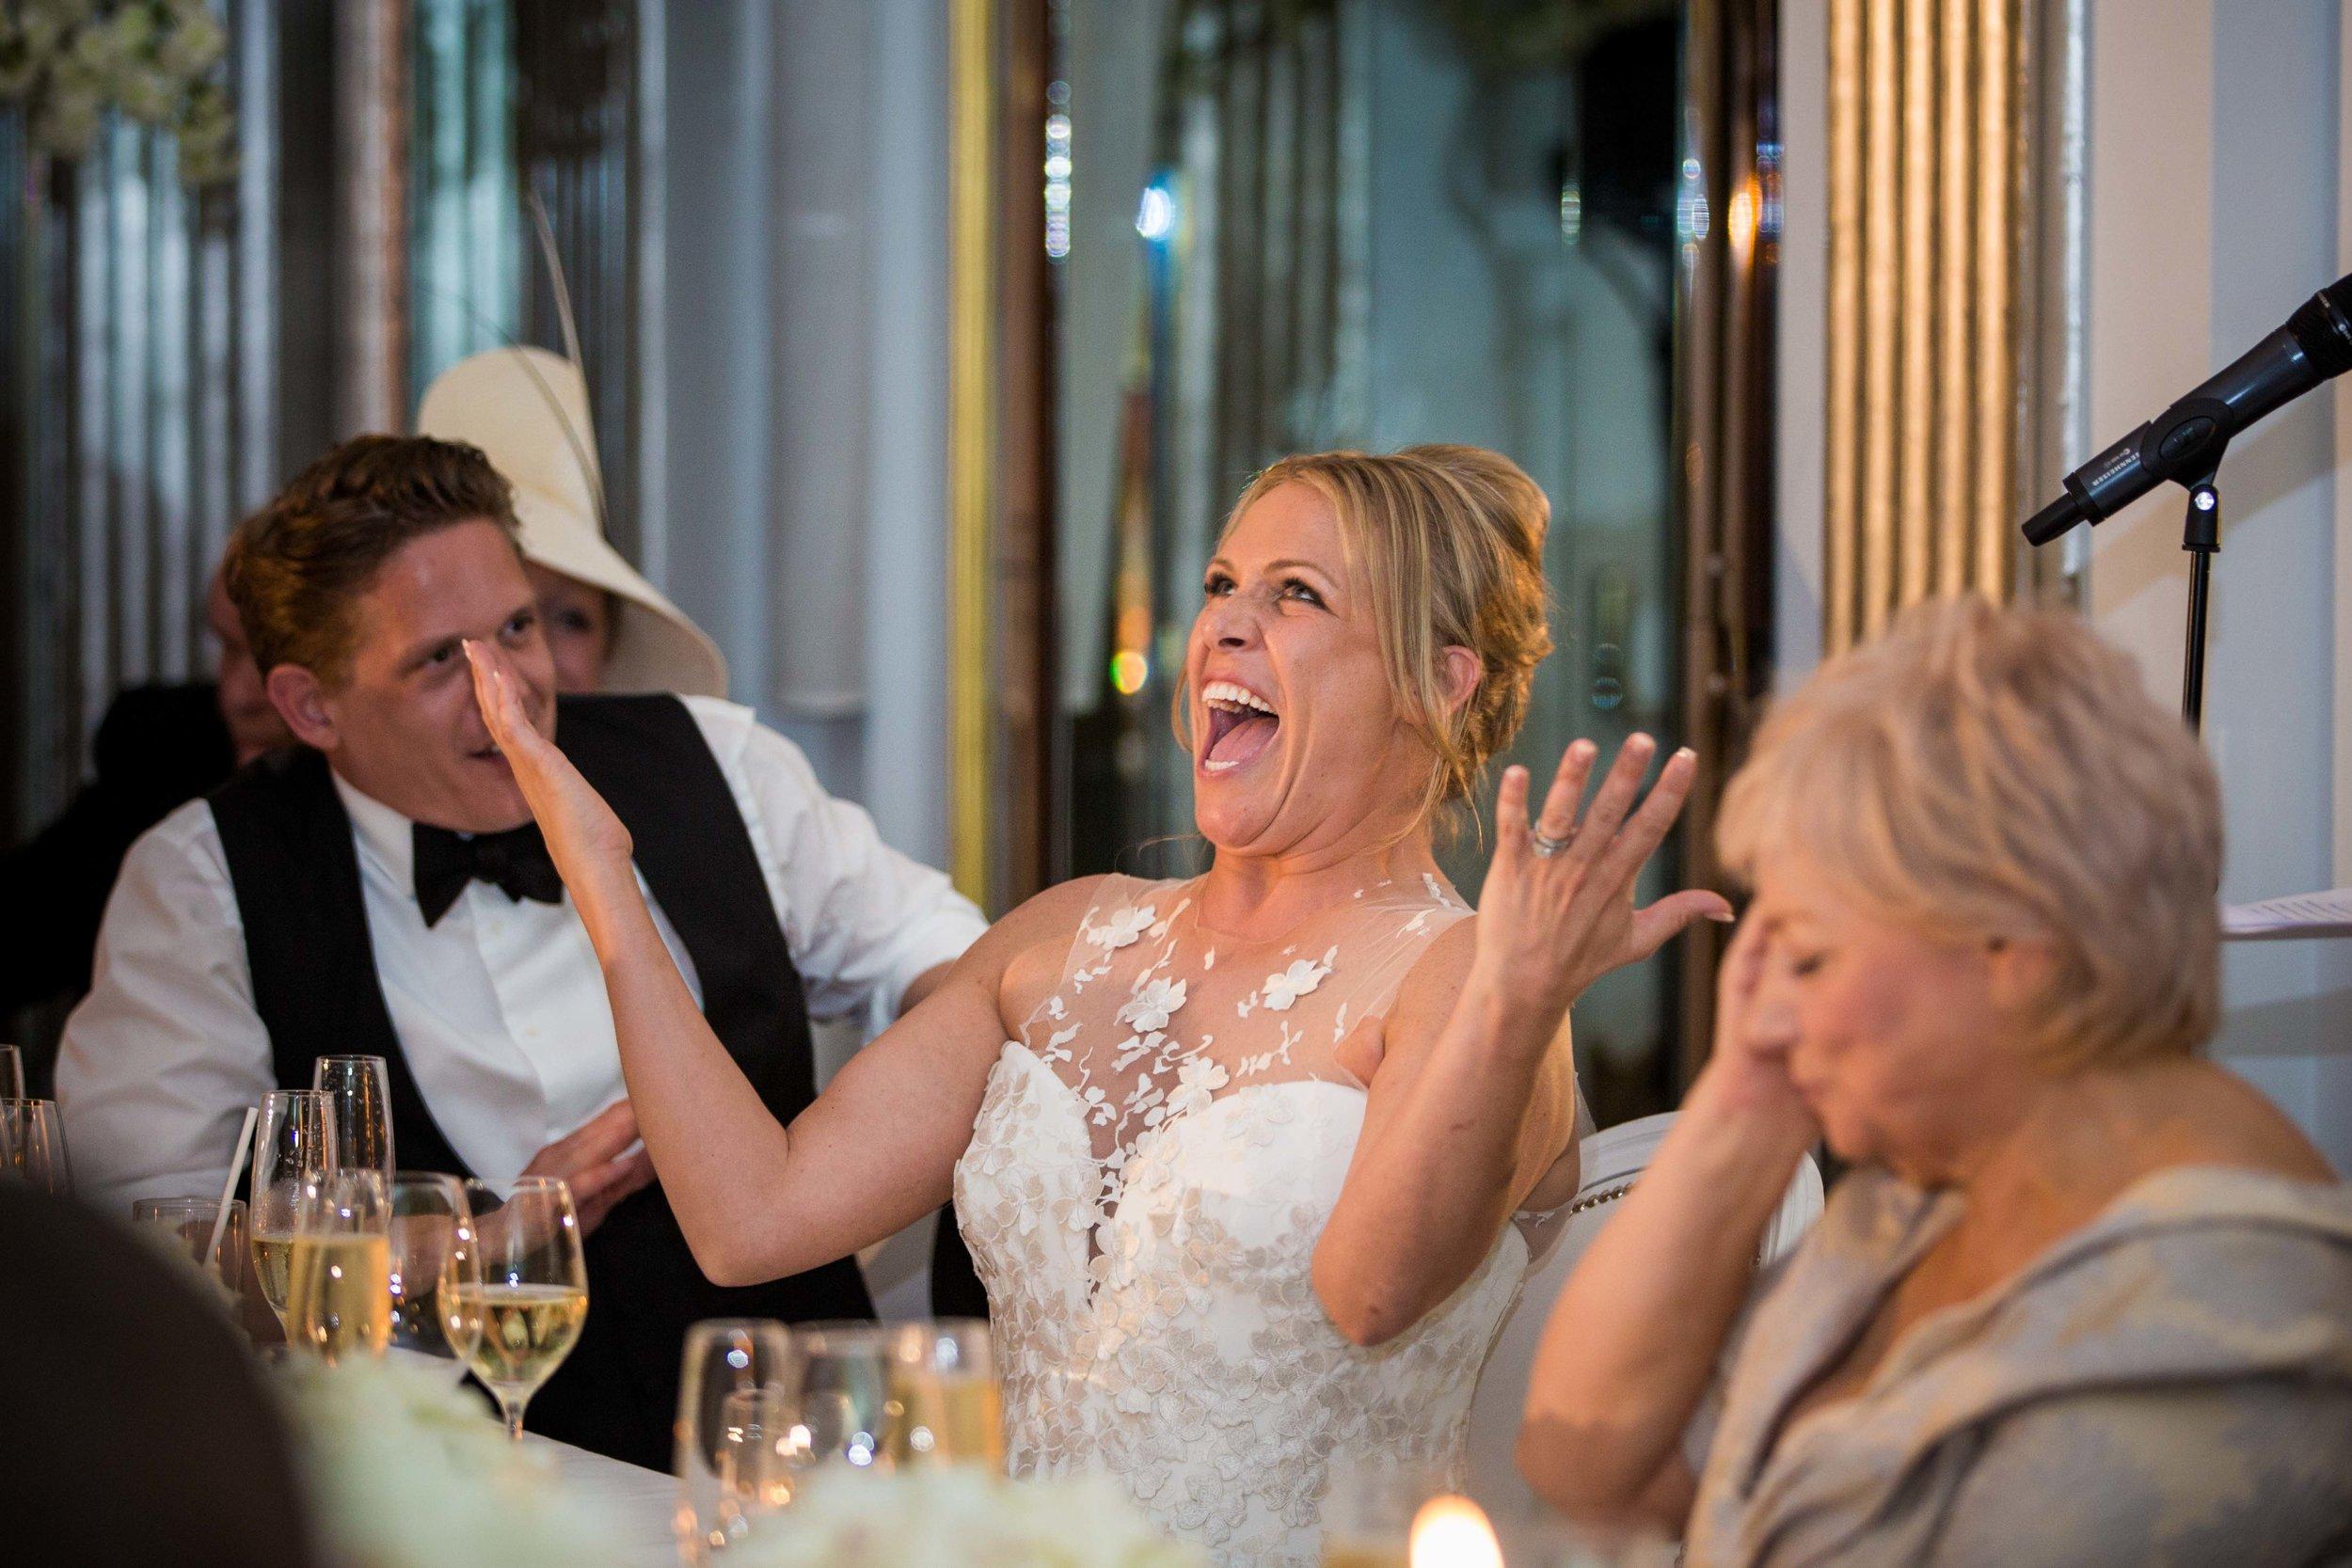 claridges-hotel-wedding-photographer-london-mayfair-natalia-smith-photography-122.jpg